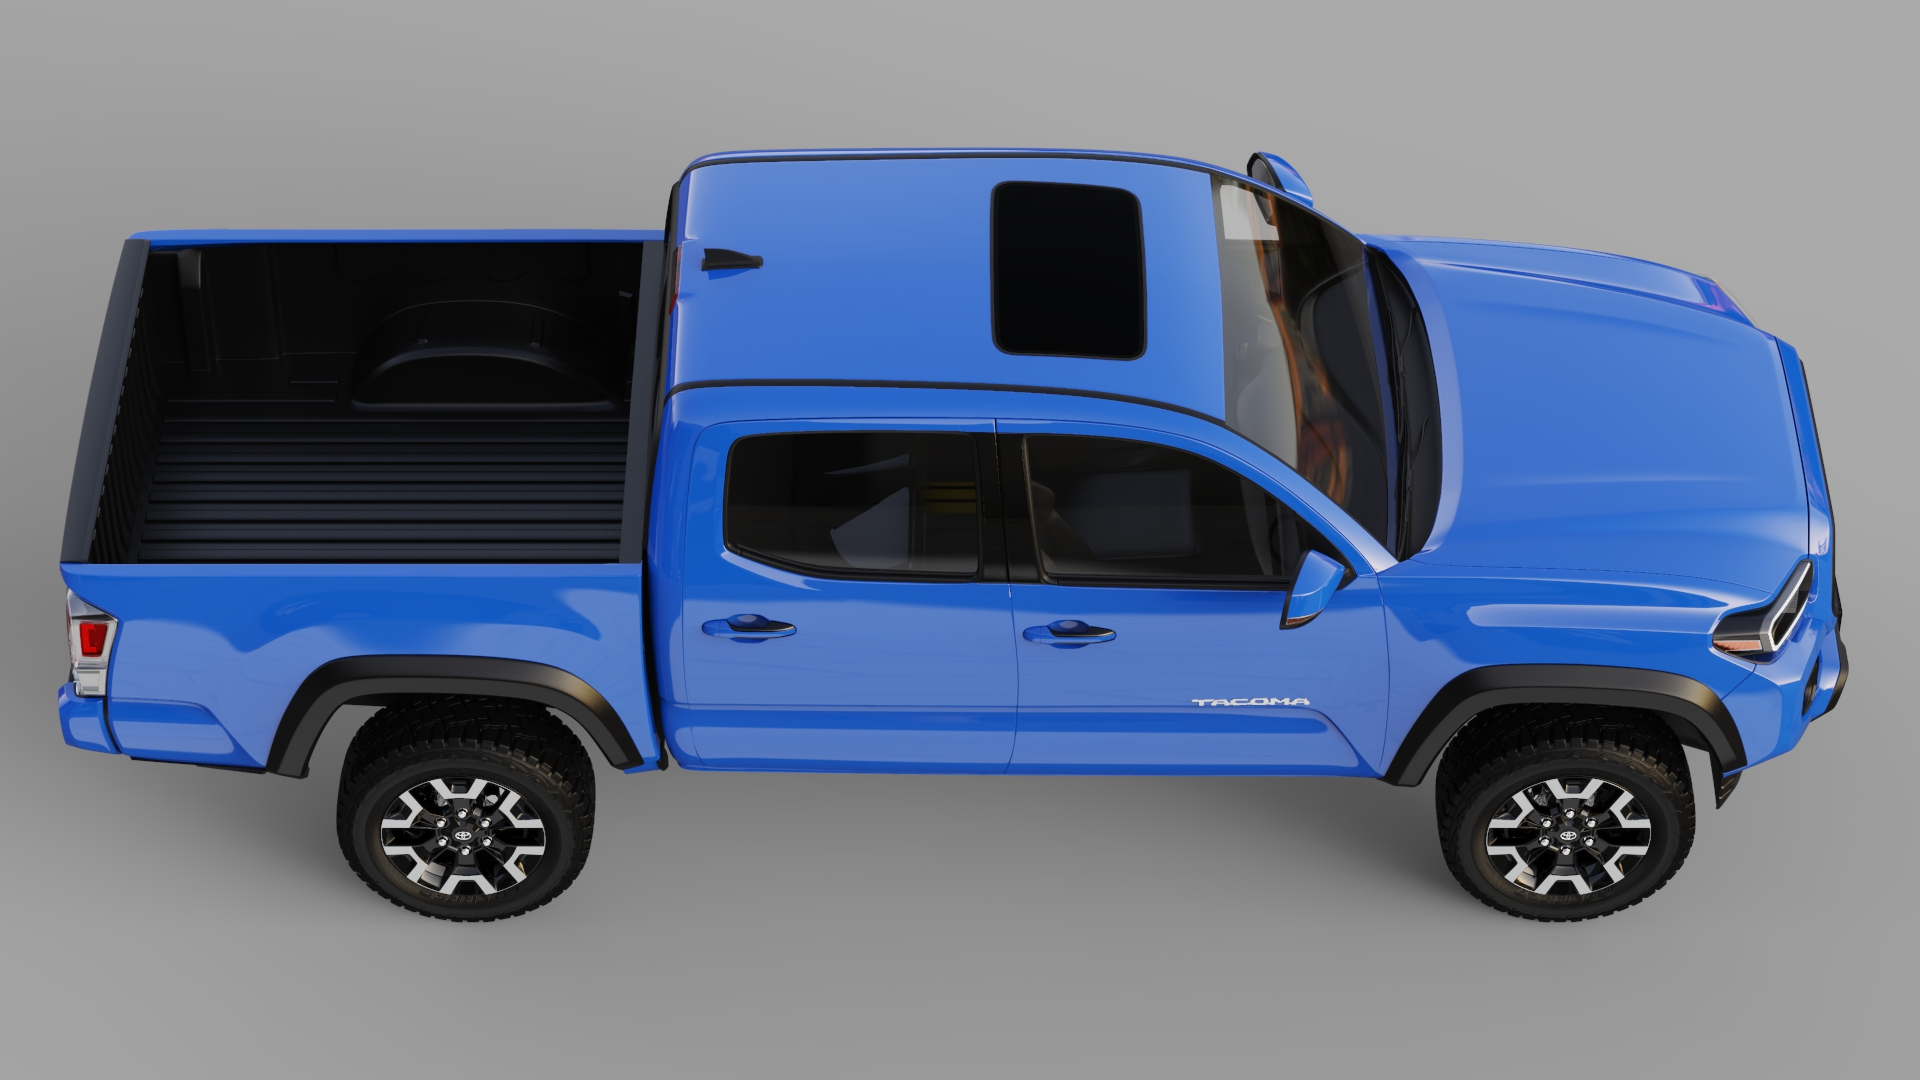 丰田Tacoma  2020款丰田Tacoma皮卡车3D模型